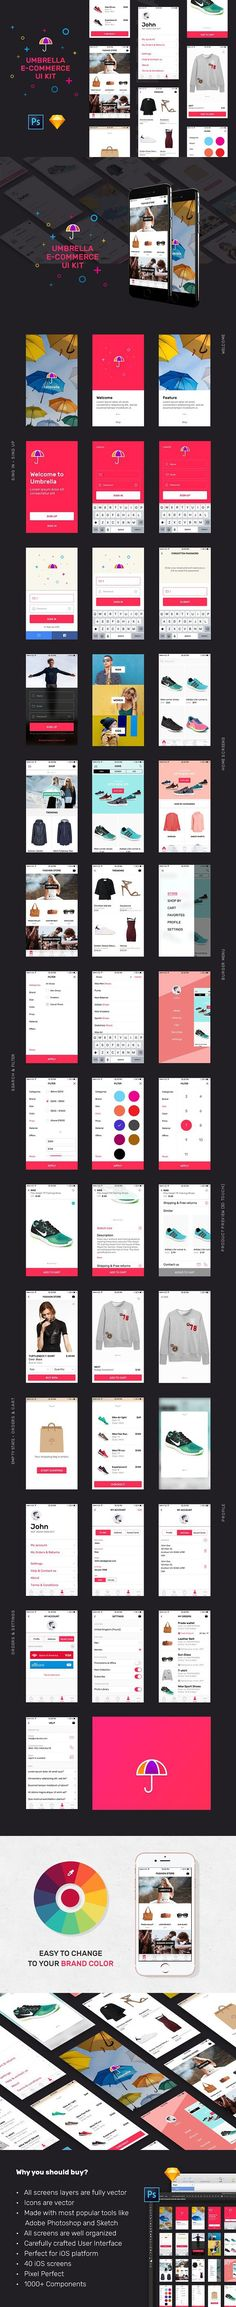 Umbrella iOS e-Commerce UI Kit. UI Elements. $10.00